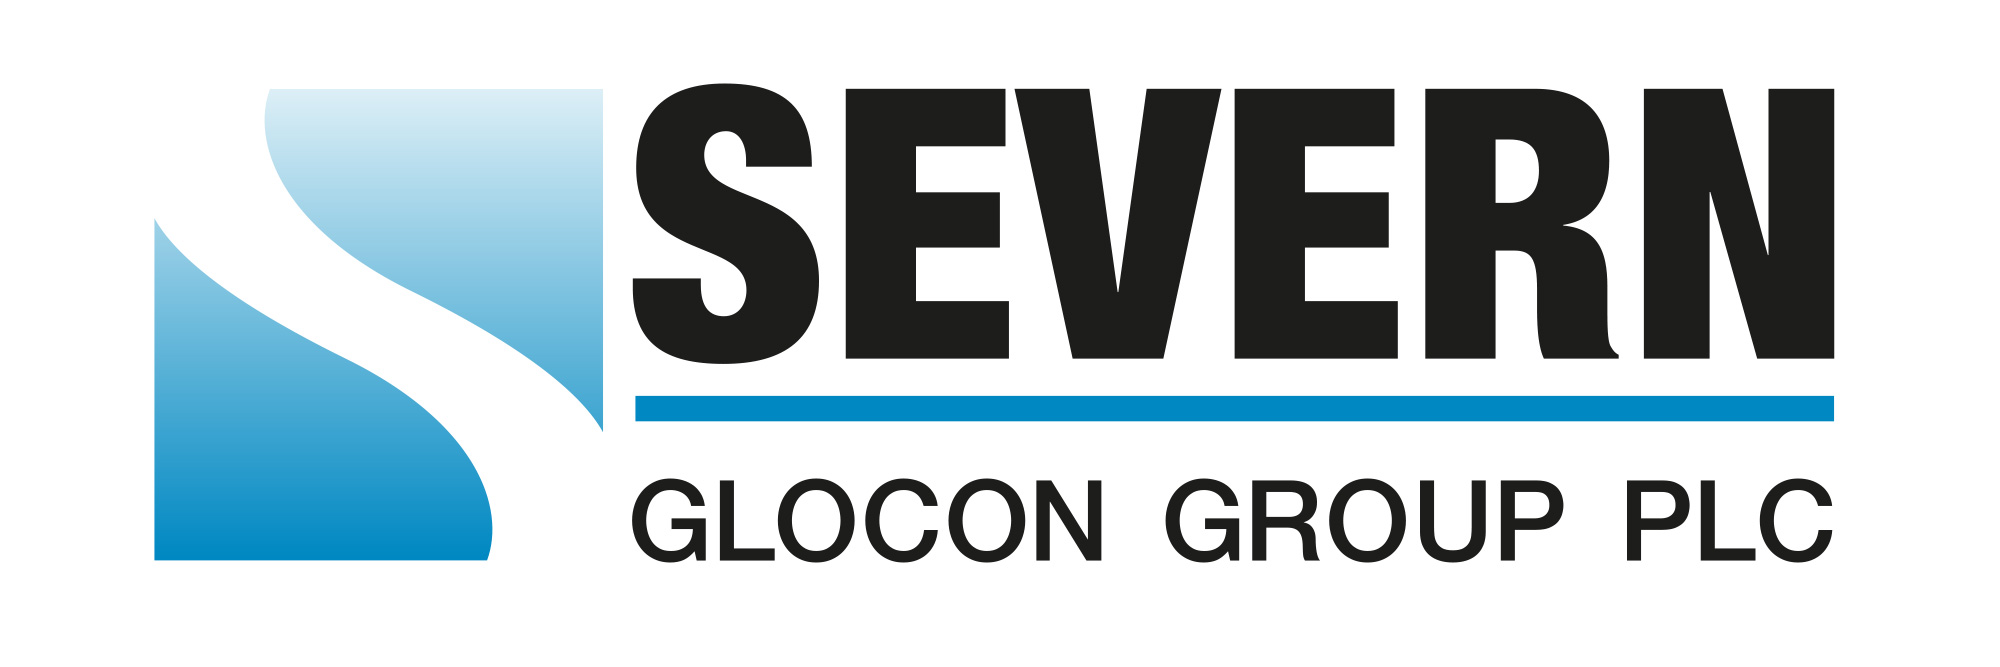 Severn-Glocon.jpg